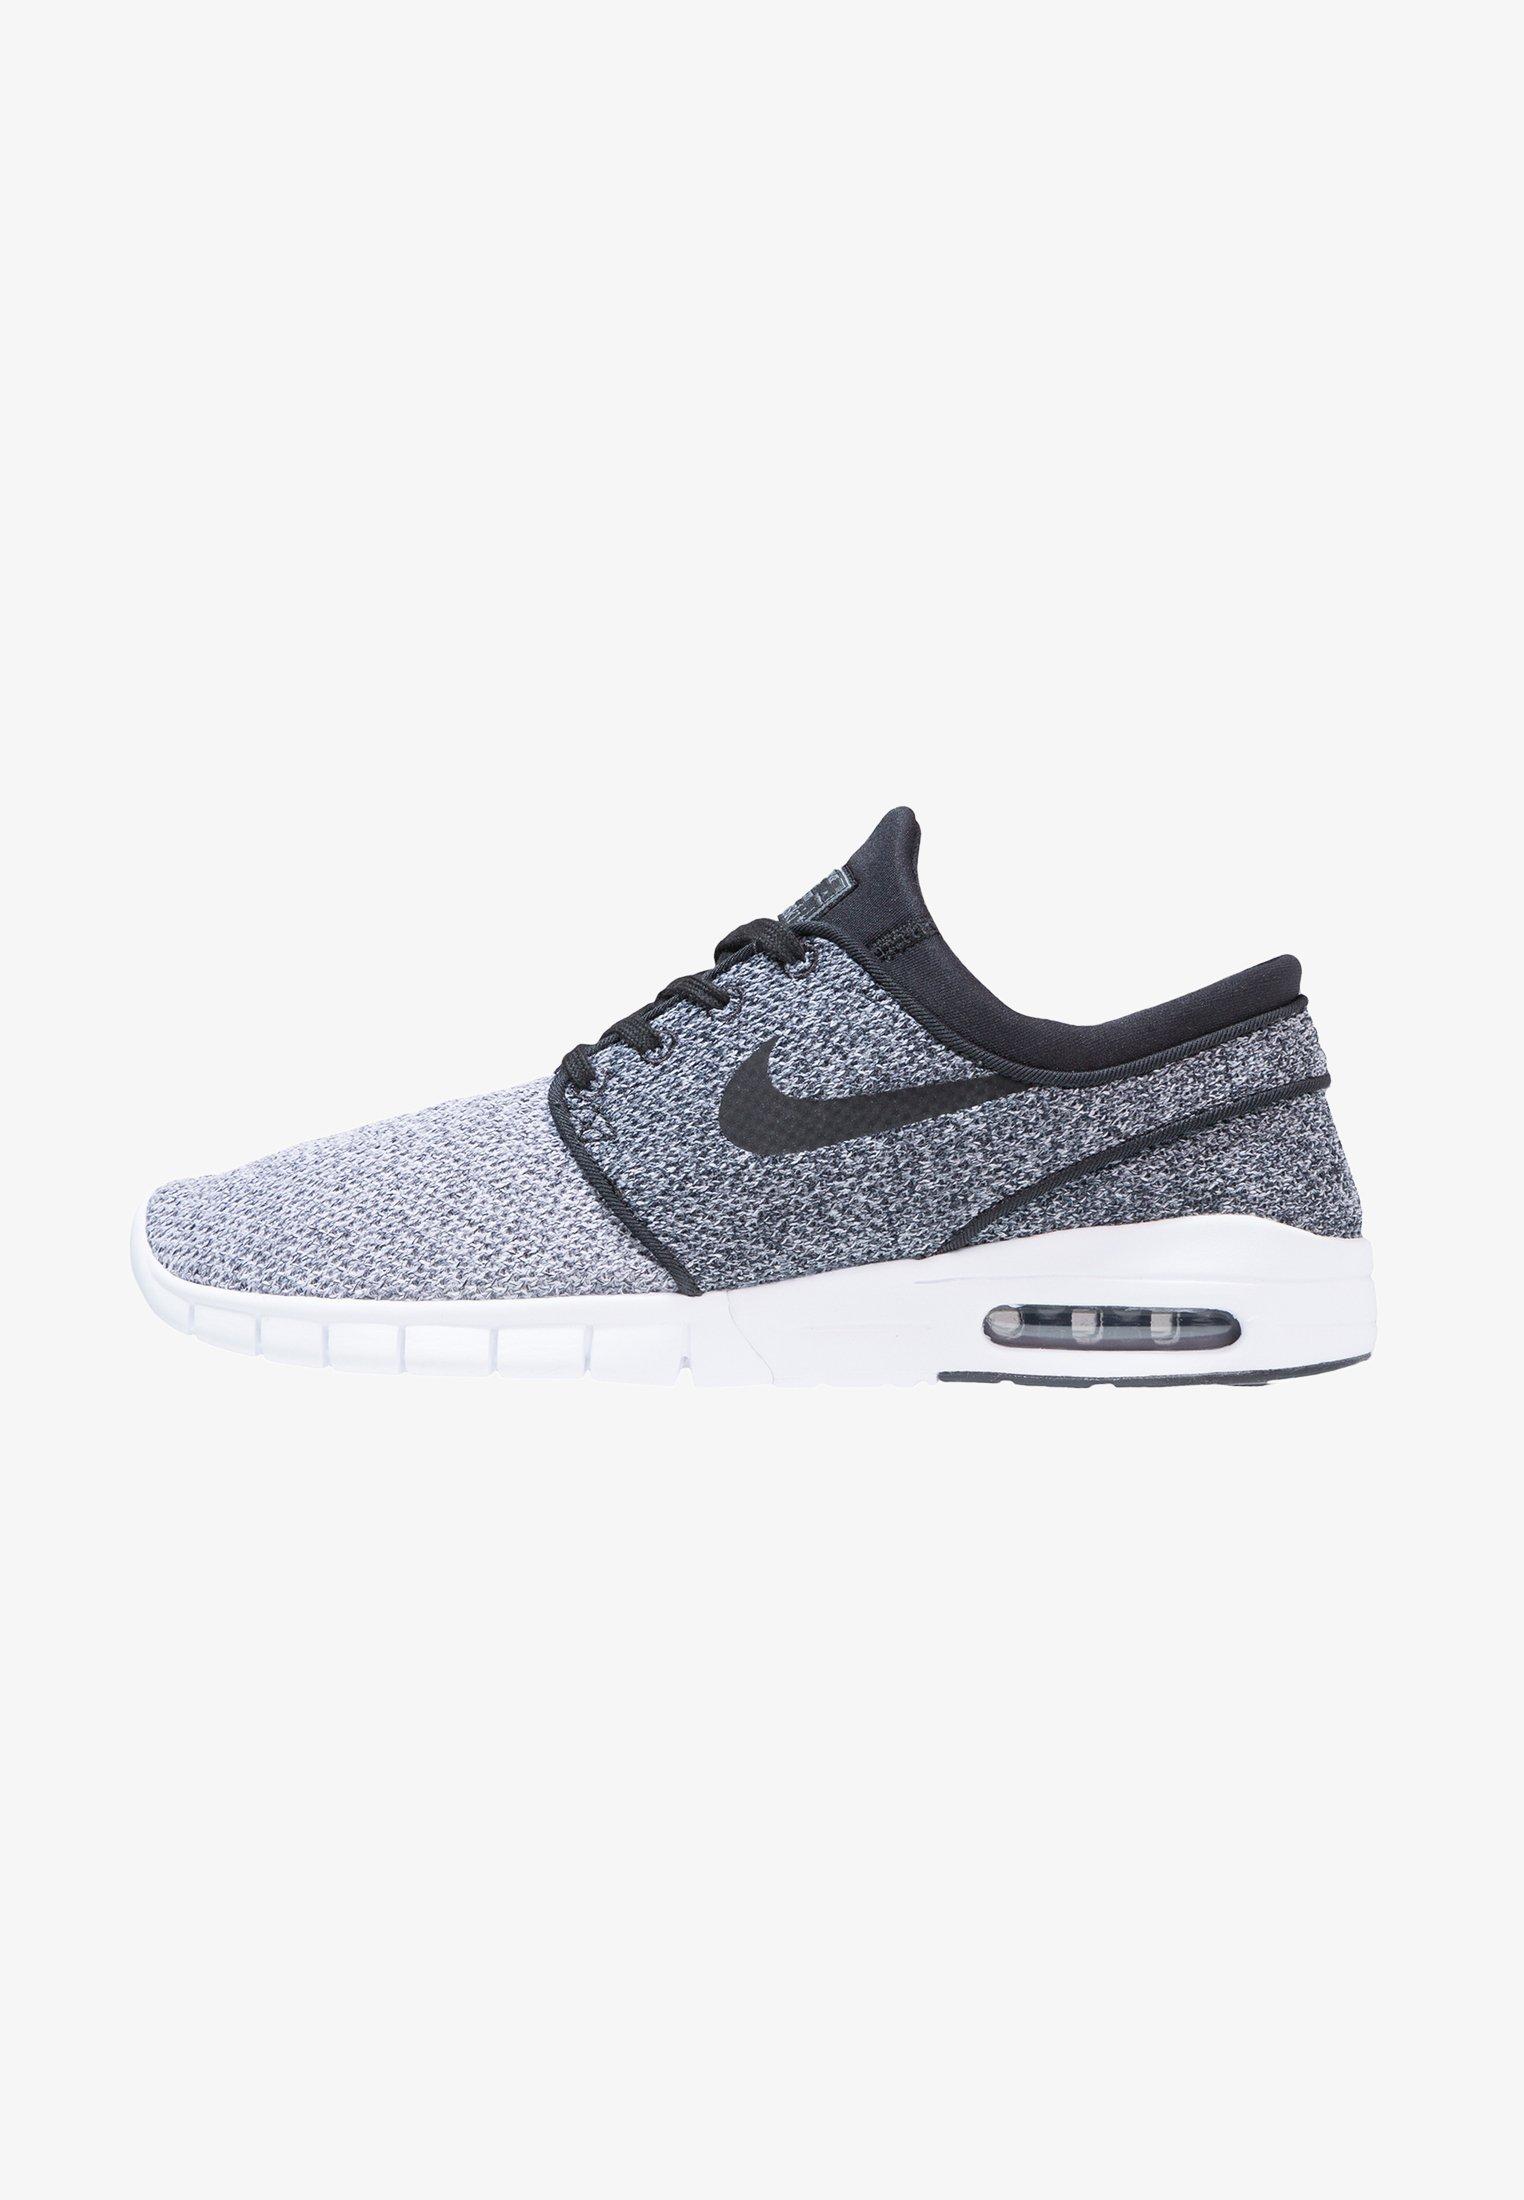 Telégrafo casual Rancio  Nike SB STEFAN JANOSKI MAX - Sneakers laag - white/black/dark grey/Grijs -  Zalando.be